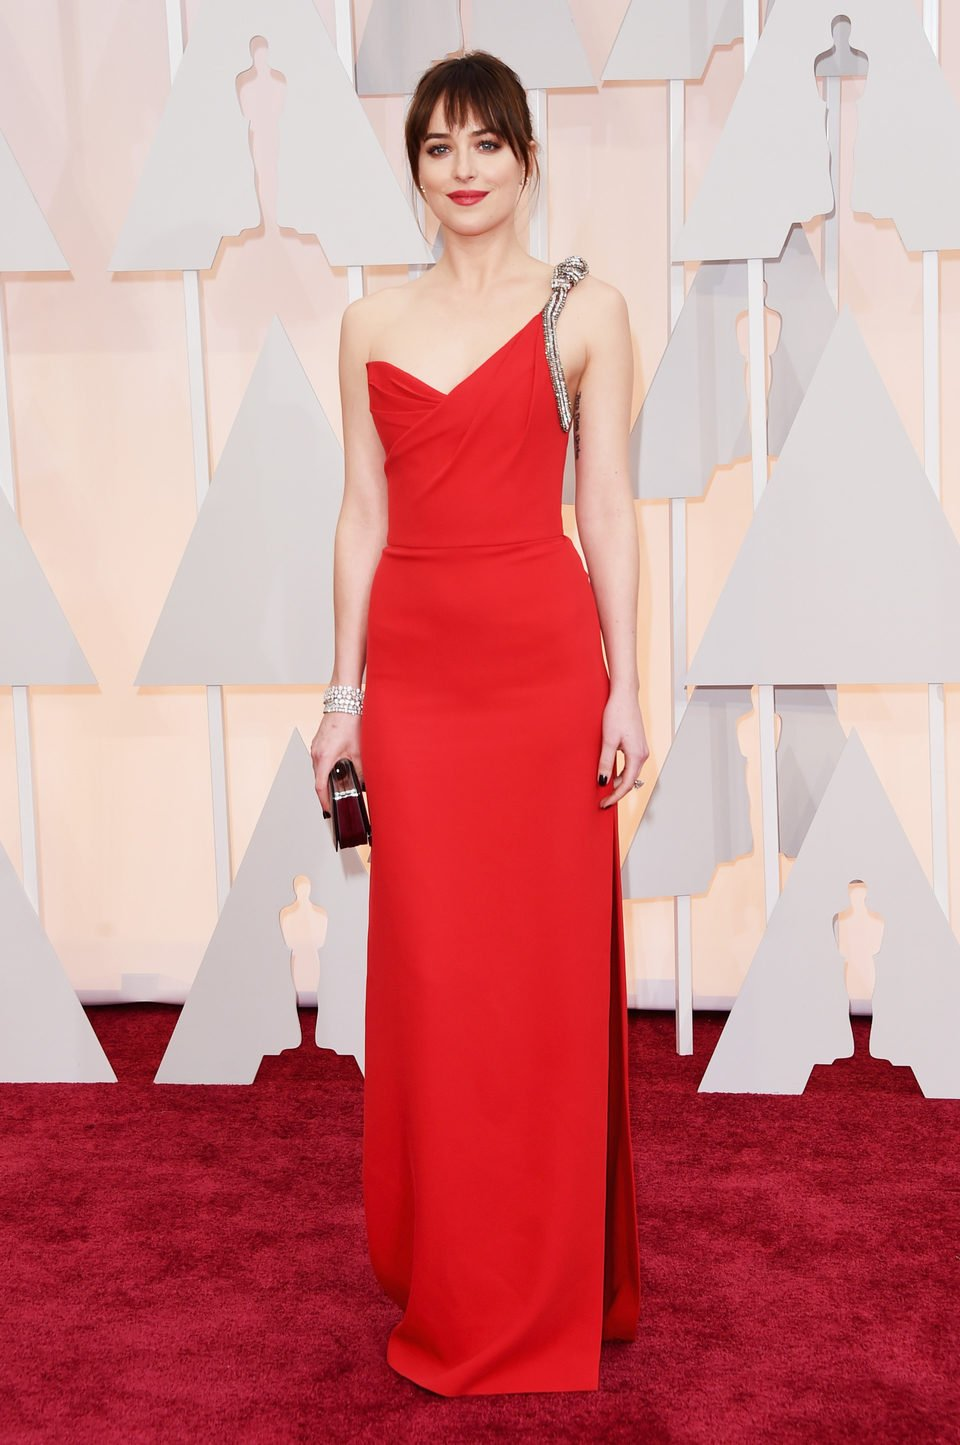 Dakota Johnson at the Oscars Awards 2015 red carpet